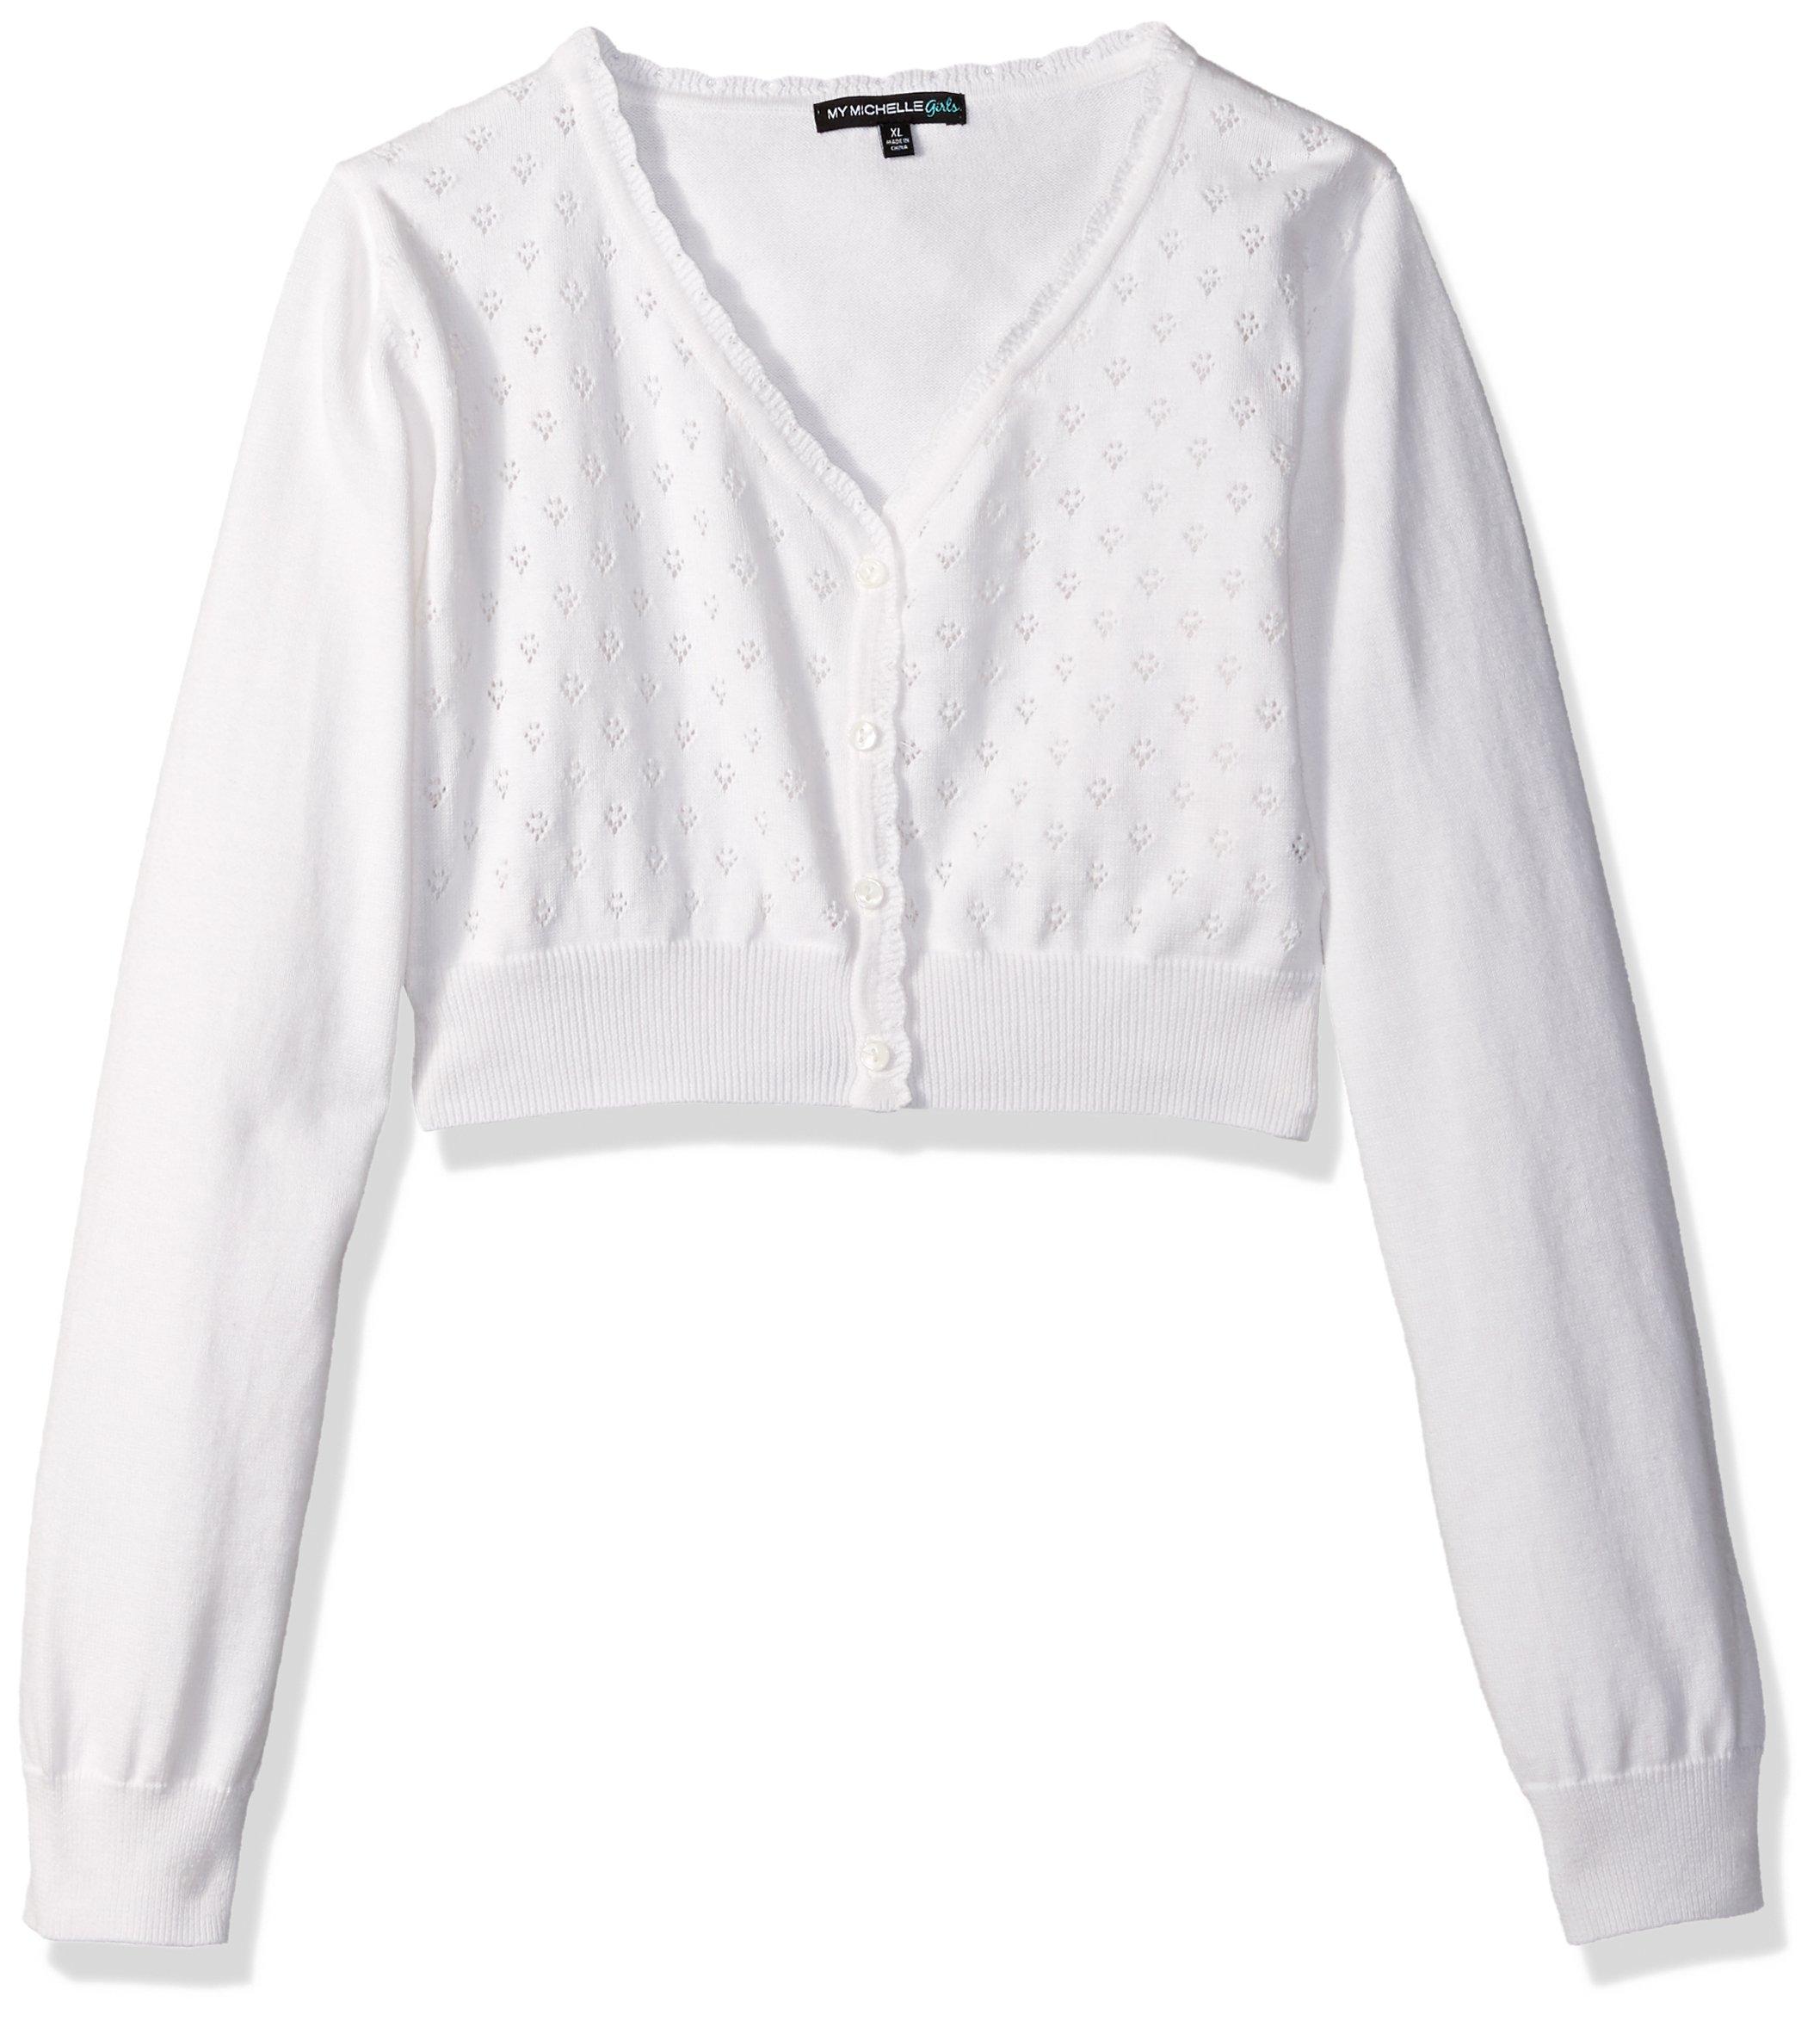 My Michelle Big Girls' Long Sleeve Pointelle Sweater, White, M